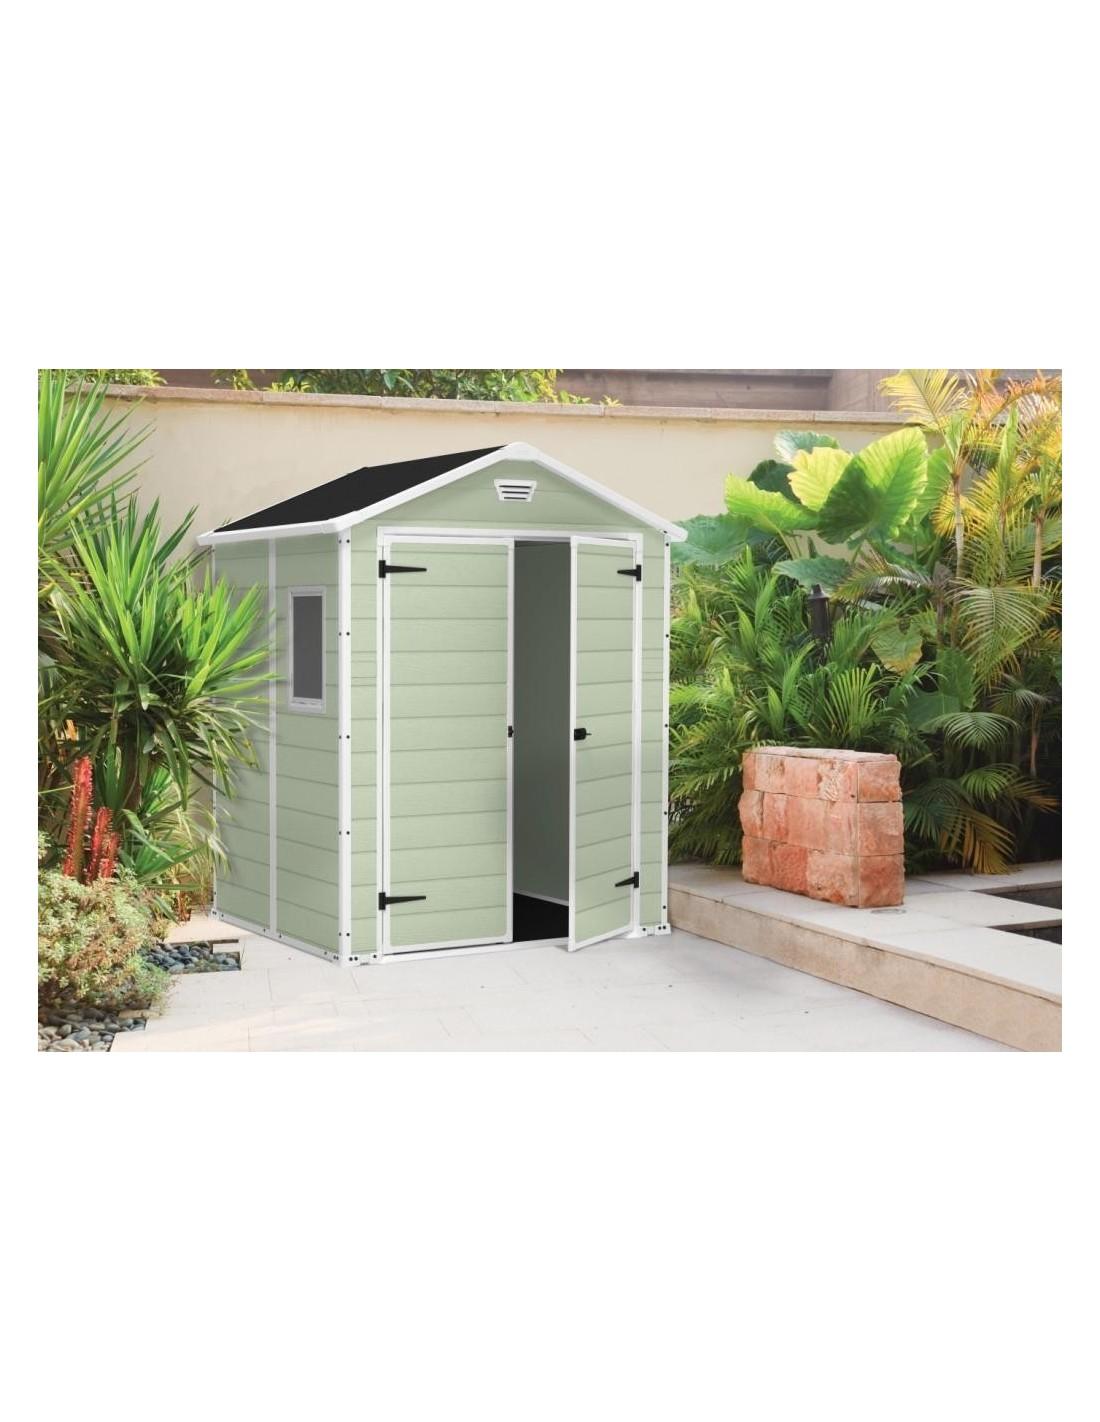 Abri de jardin premium 65 2 portes vert en r sine 2 8 m3 - Abri de jardin en resine premium 65 ...